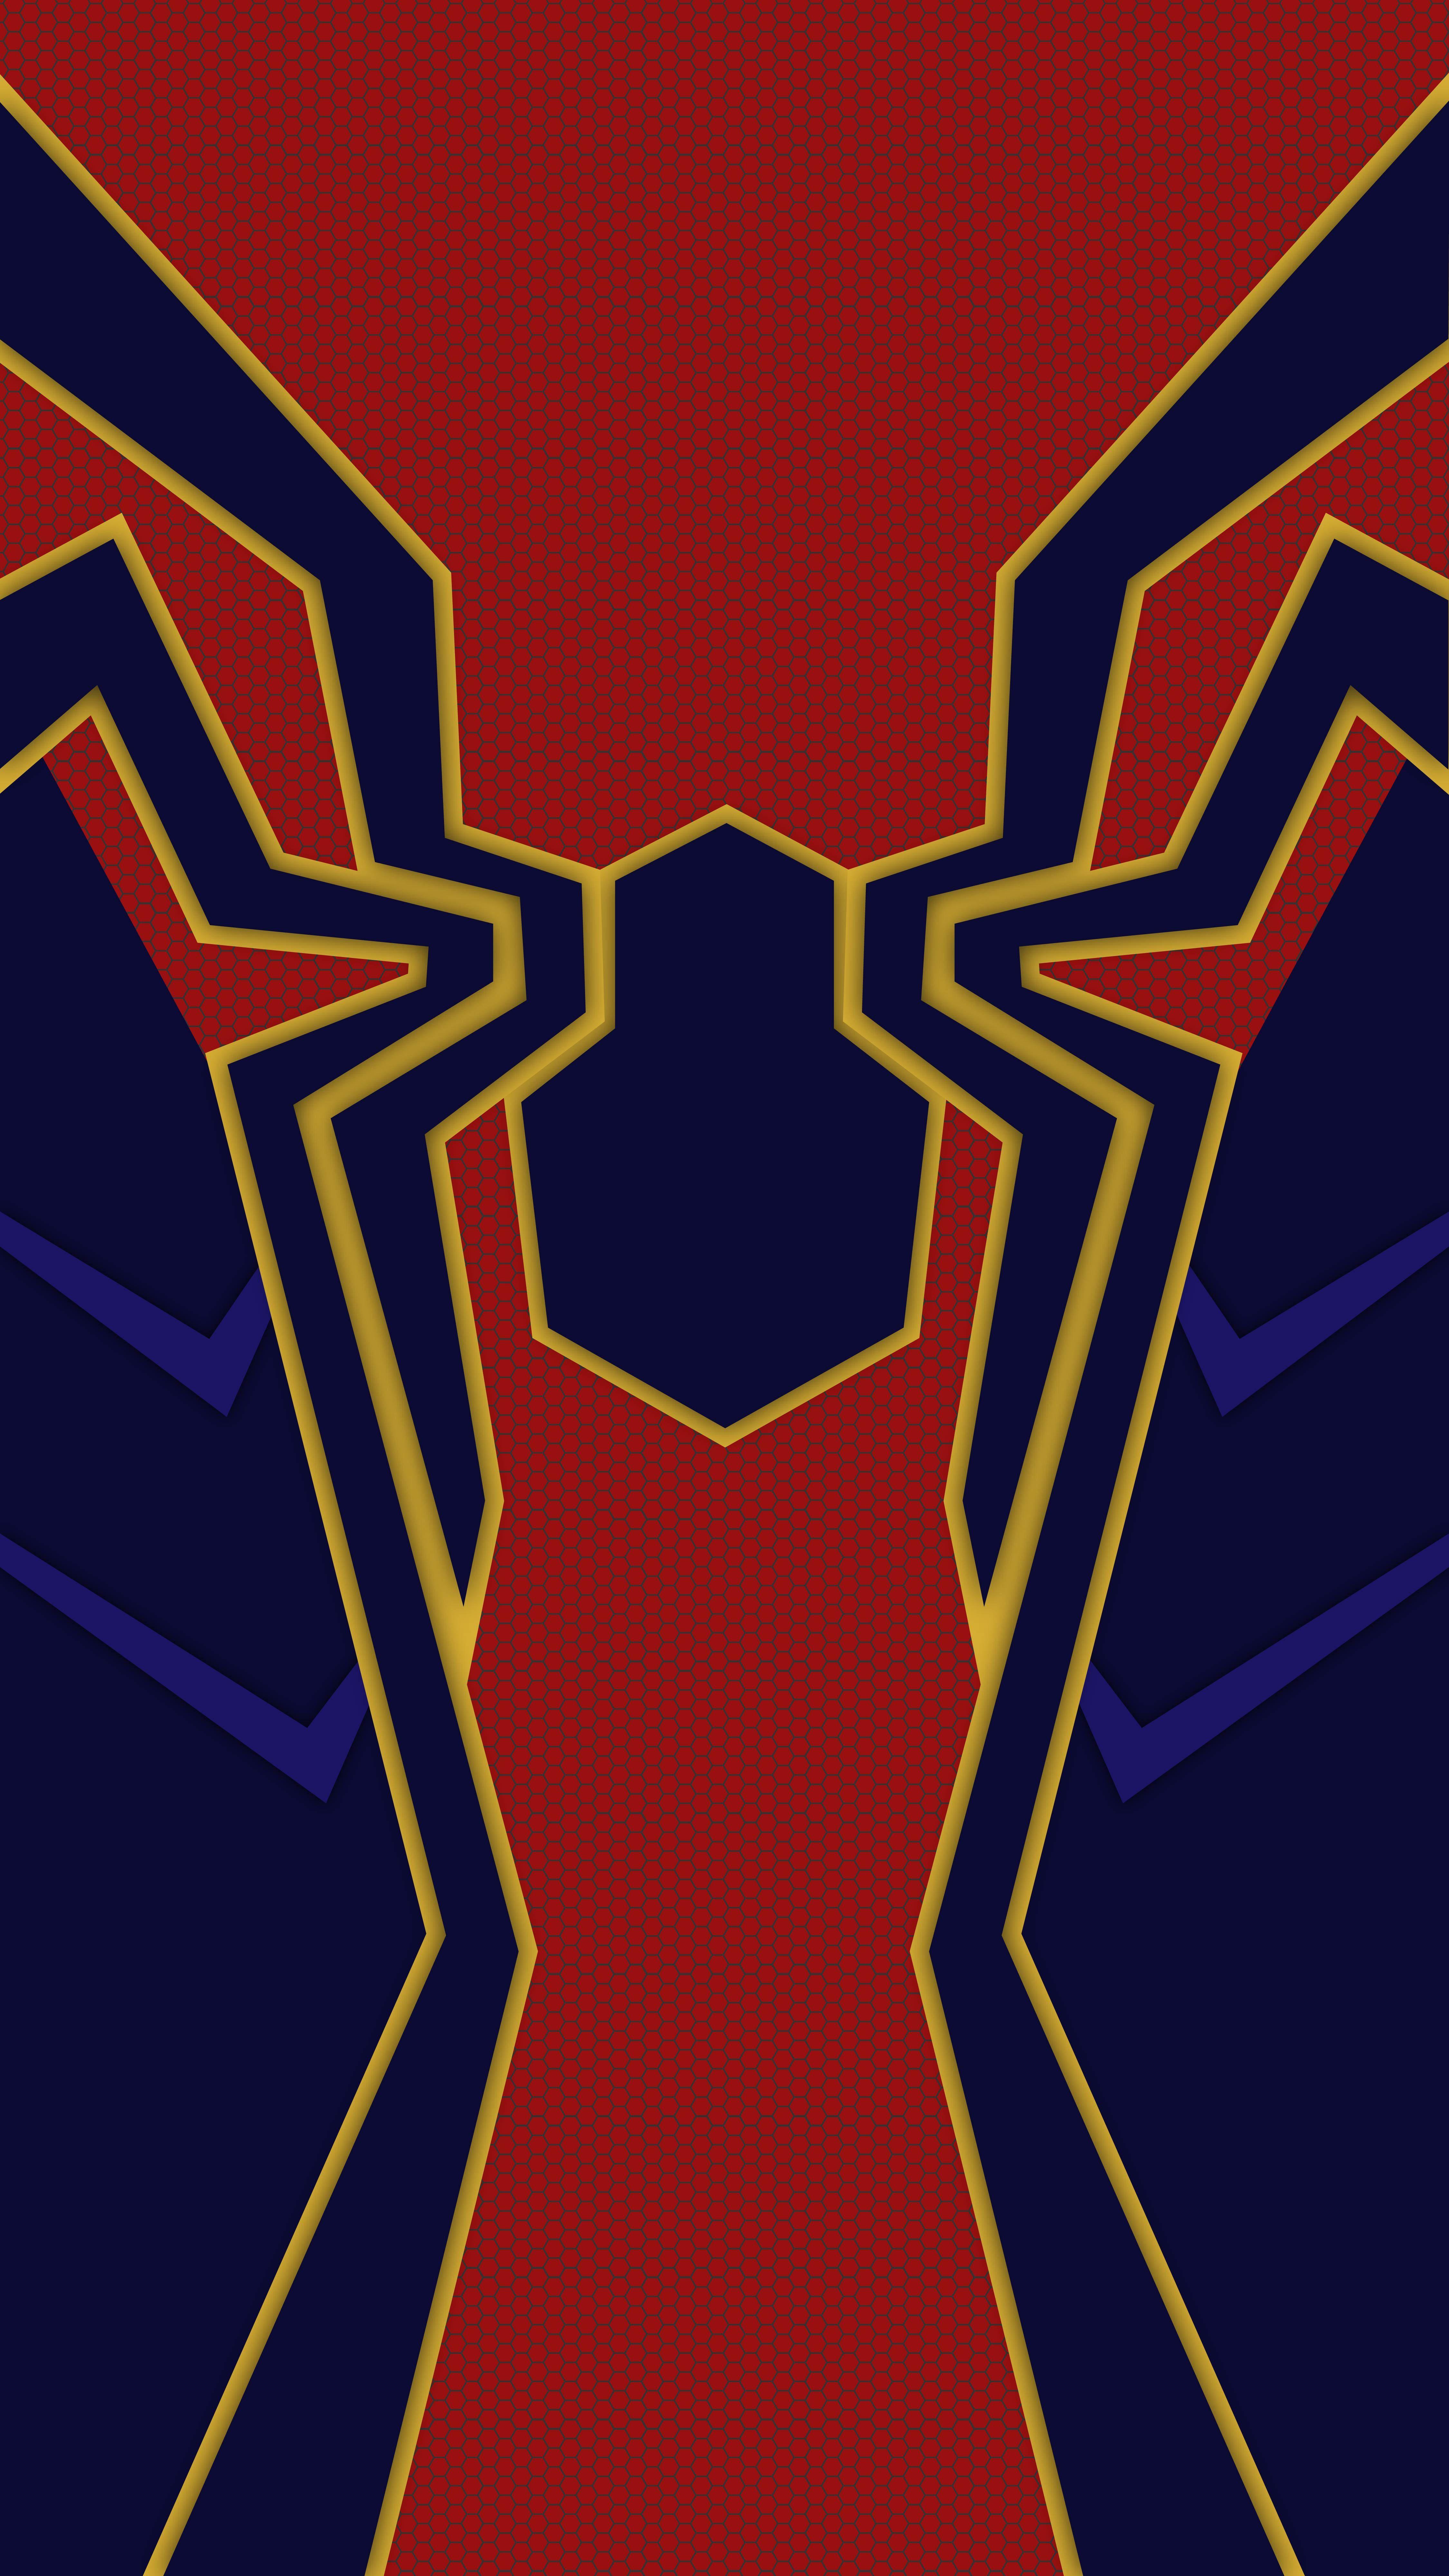 Avenger Endgame Wallpaper Iphone 46e01b832dd9f99404ec8829c55a5716